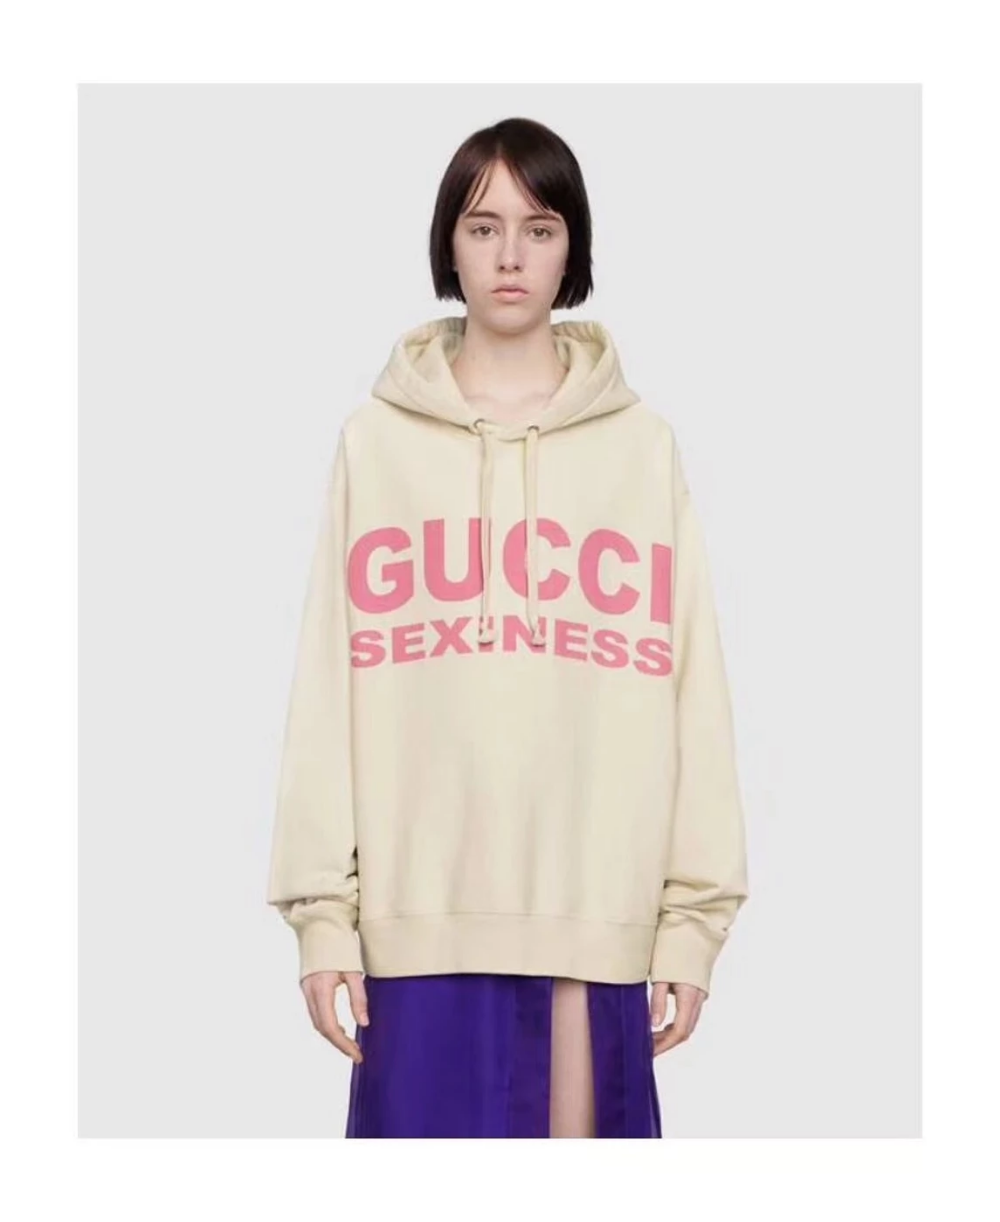 Gucci Gucci Sexiness Print Sweatshirt Baige Grailed Sweatshirts Printed Sweatshirts Gucci [ 1222 x 1000 Pixel ]